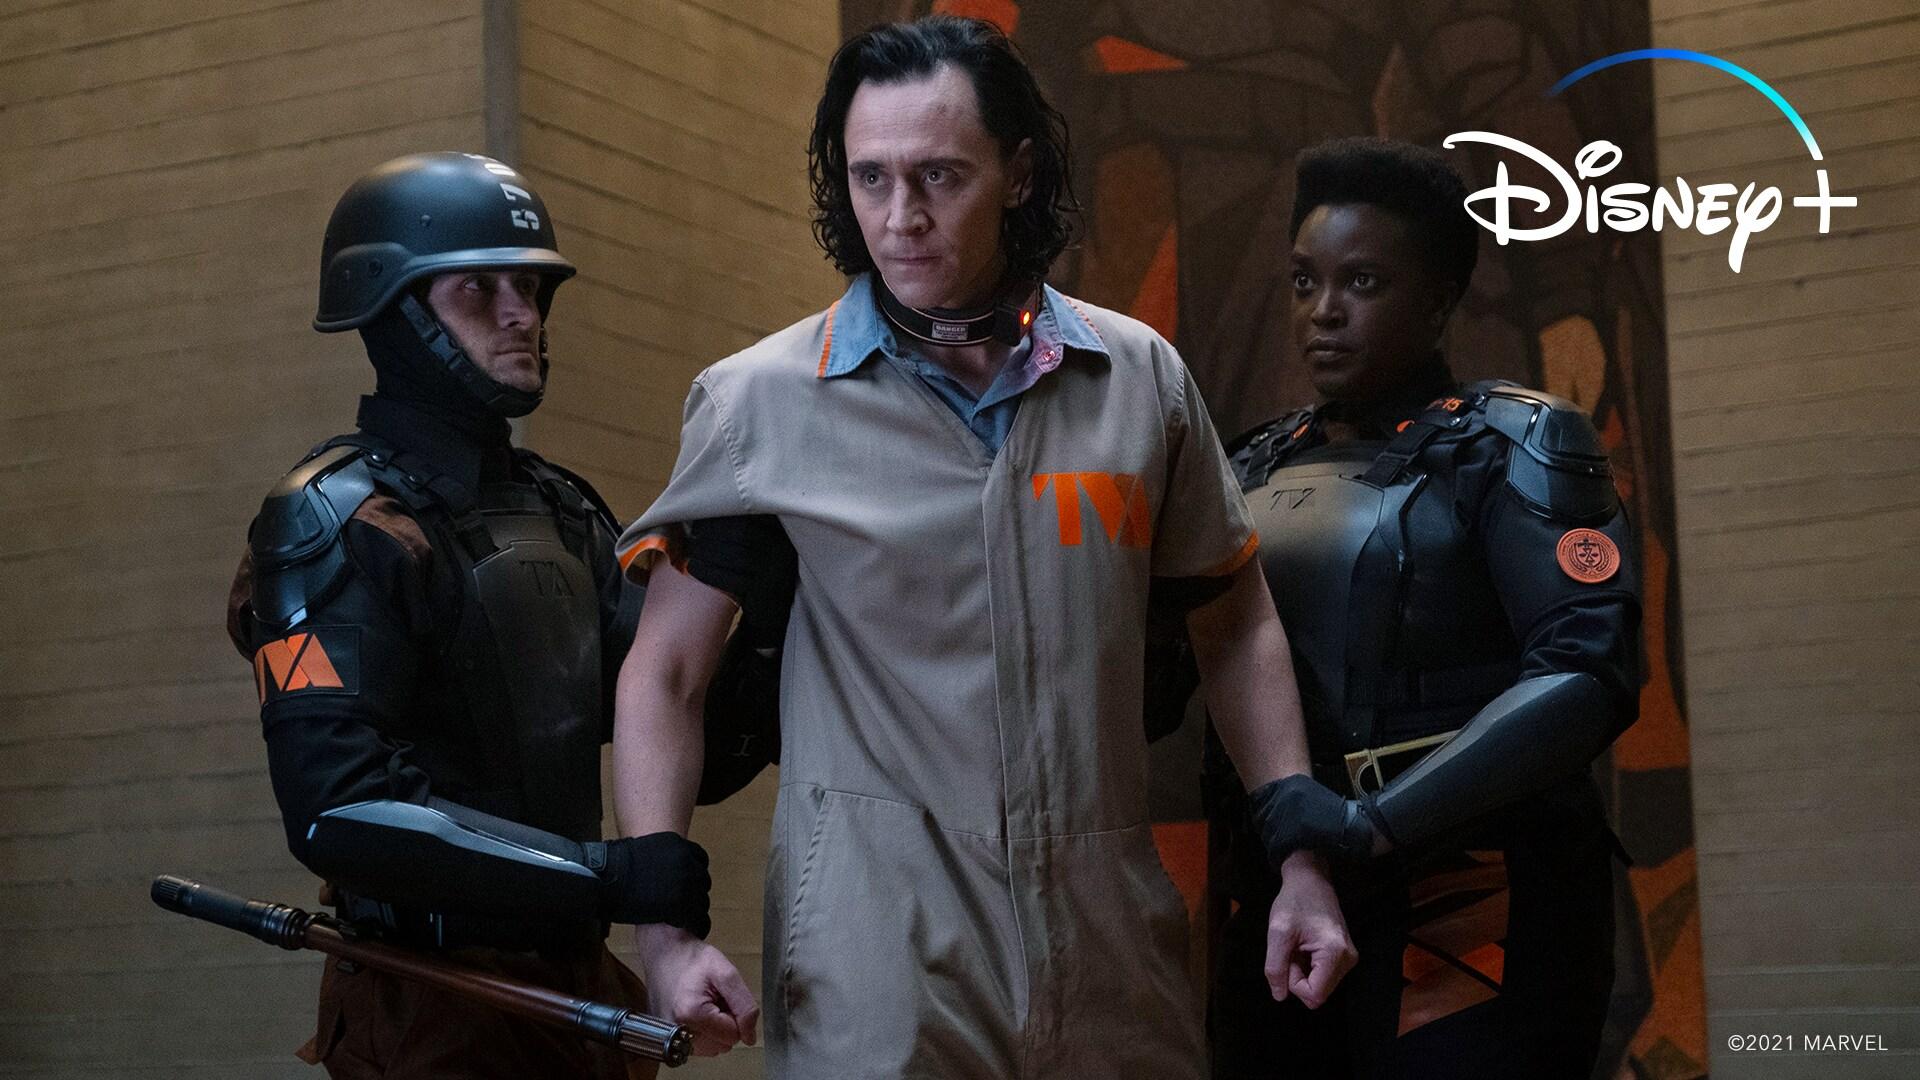 Low-Key, We're Loving These Loki Looks | Disney+